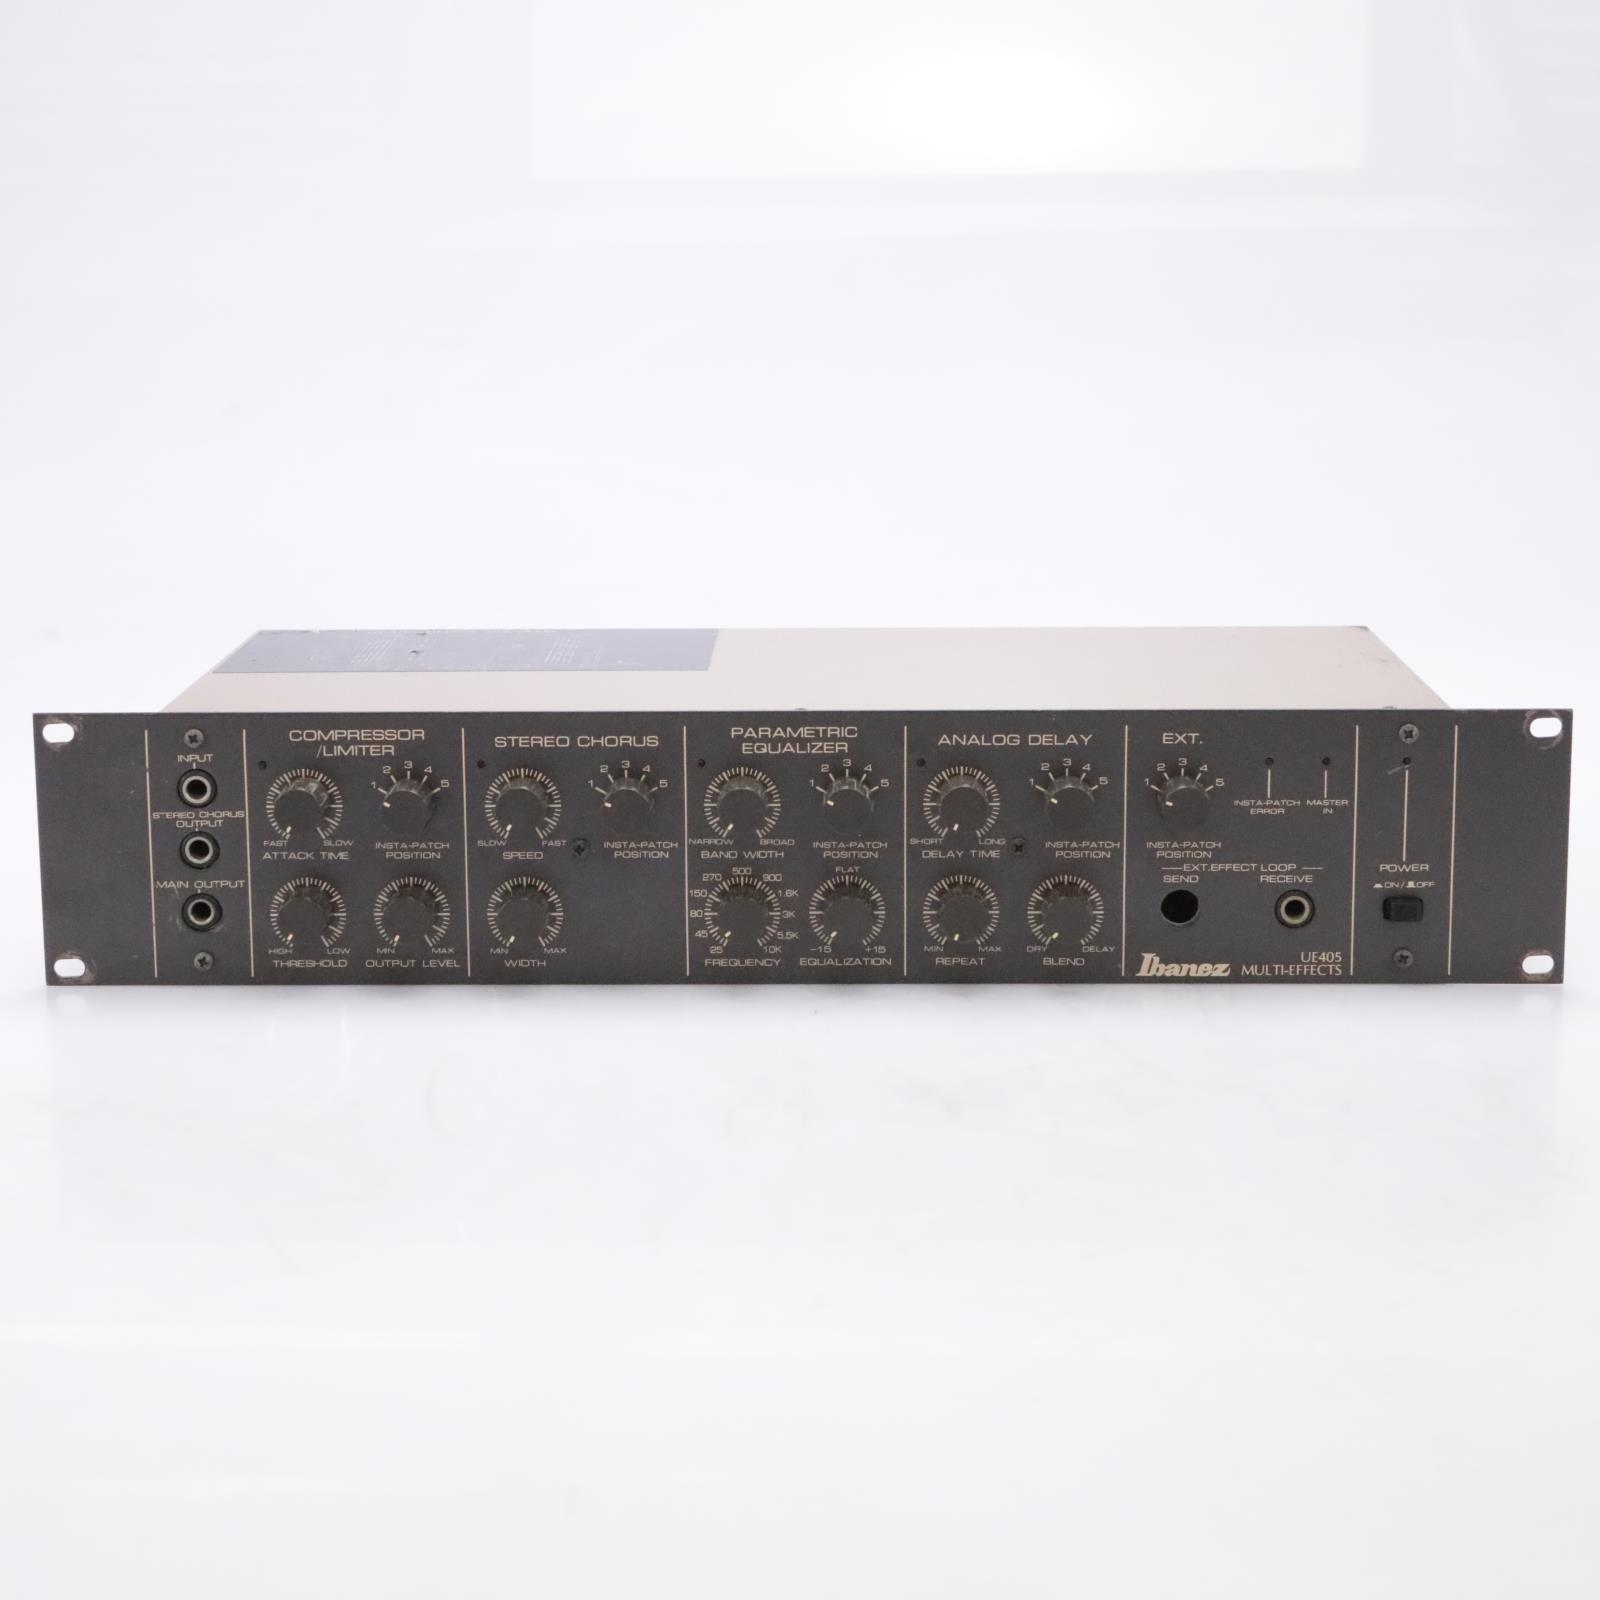 Ibanez UE405 Guitar Multi-Effects Processor Rack w/ Foot Pedalboard #44052